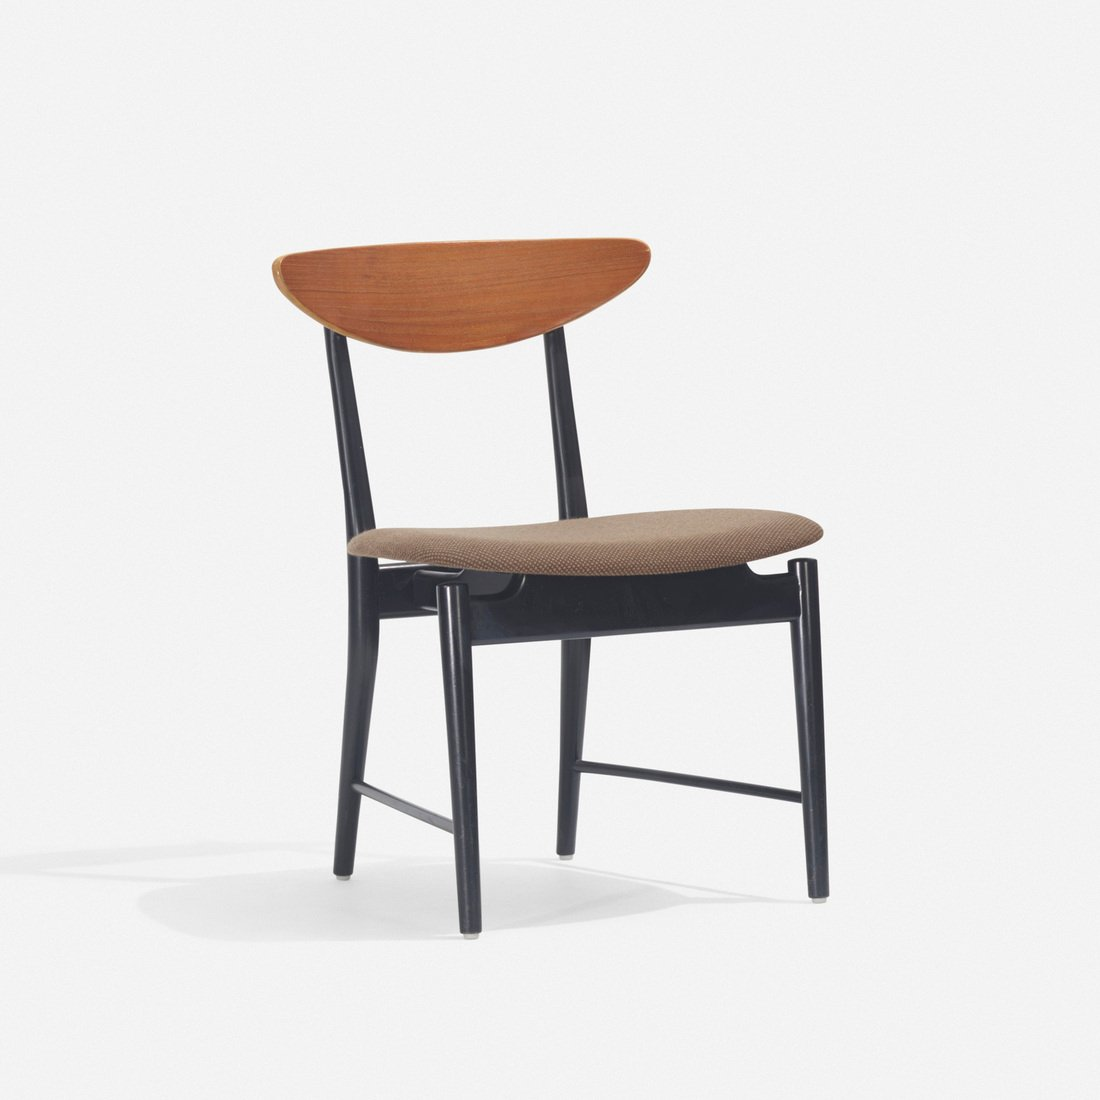 Finn Juhl, dining chair